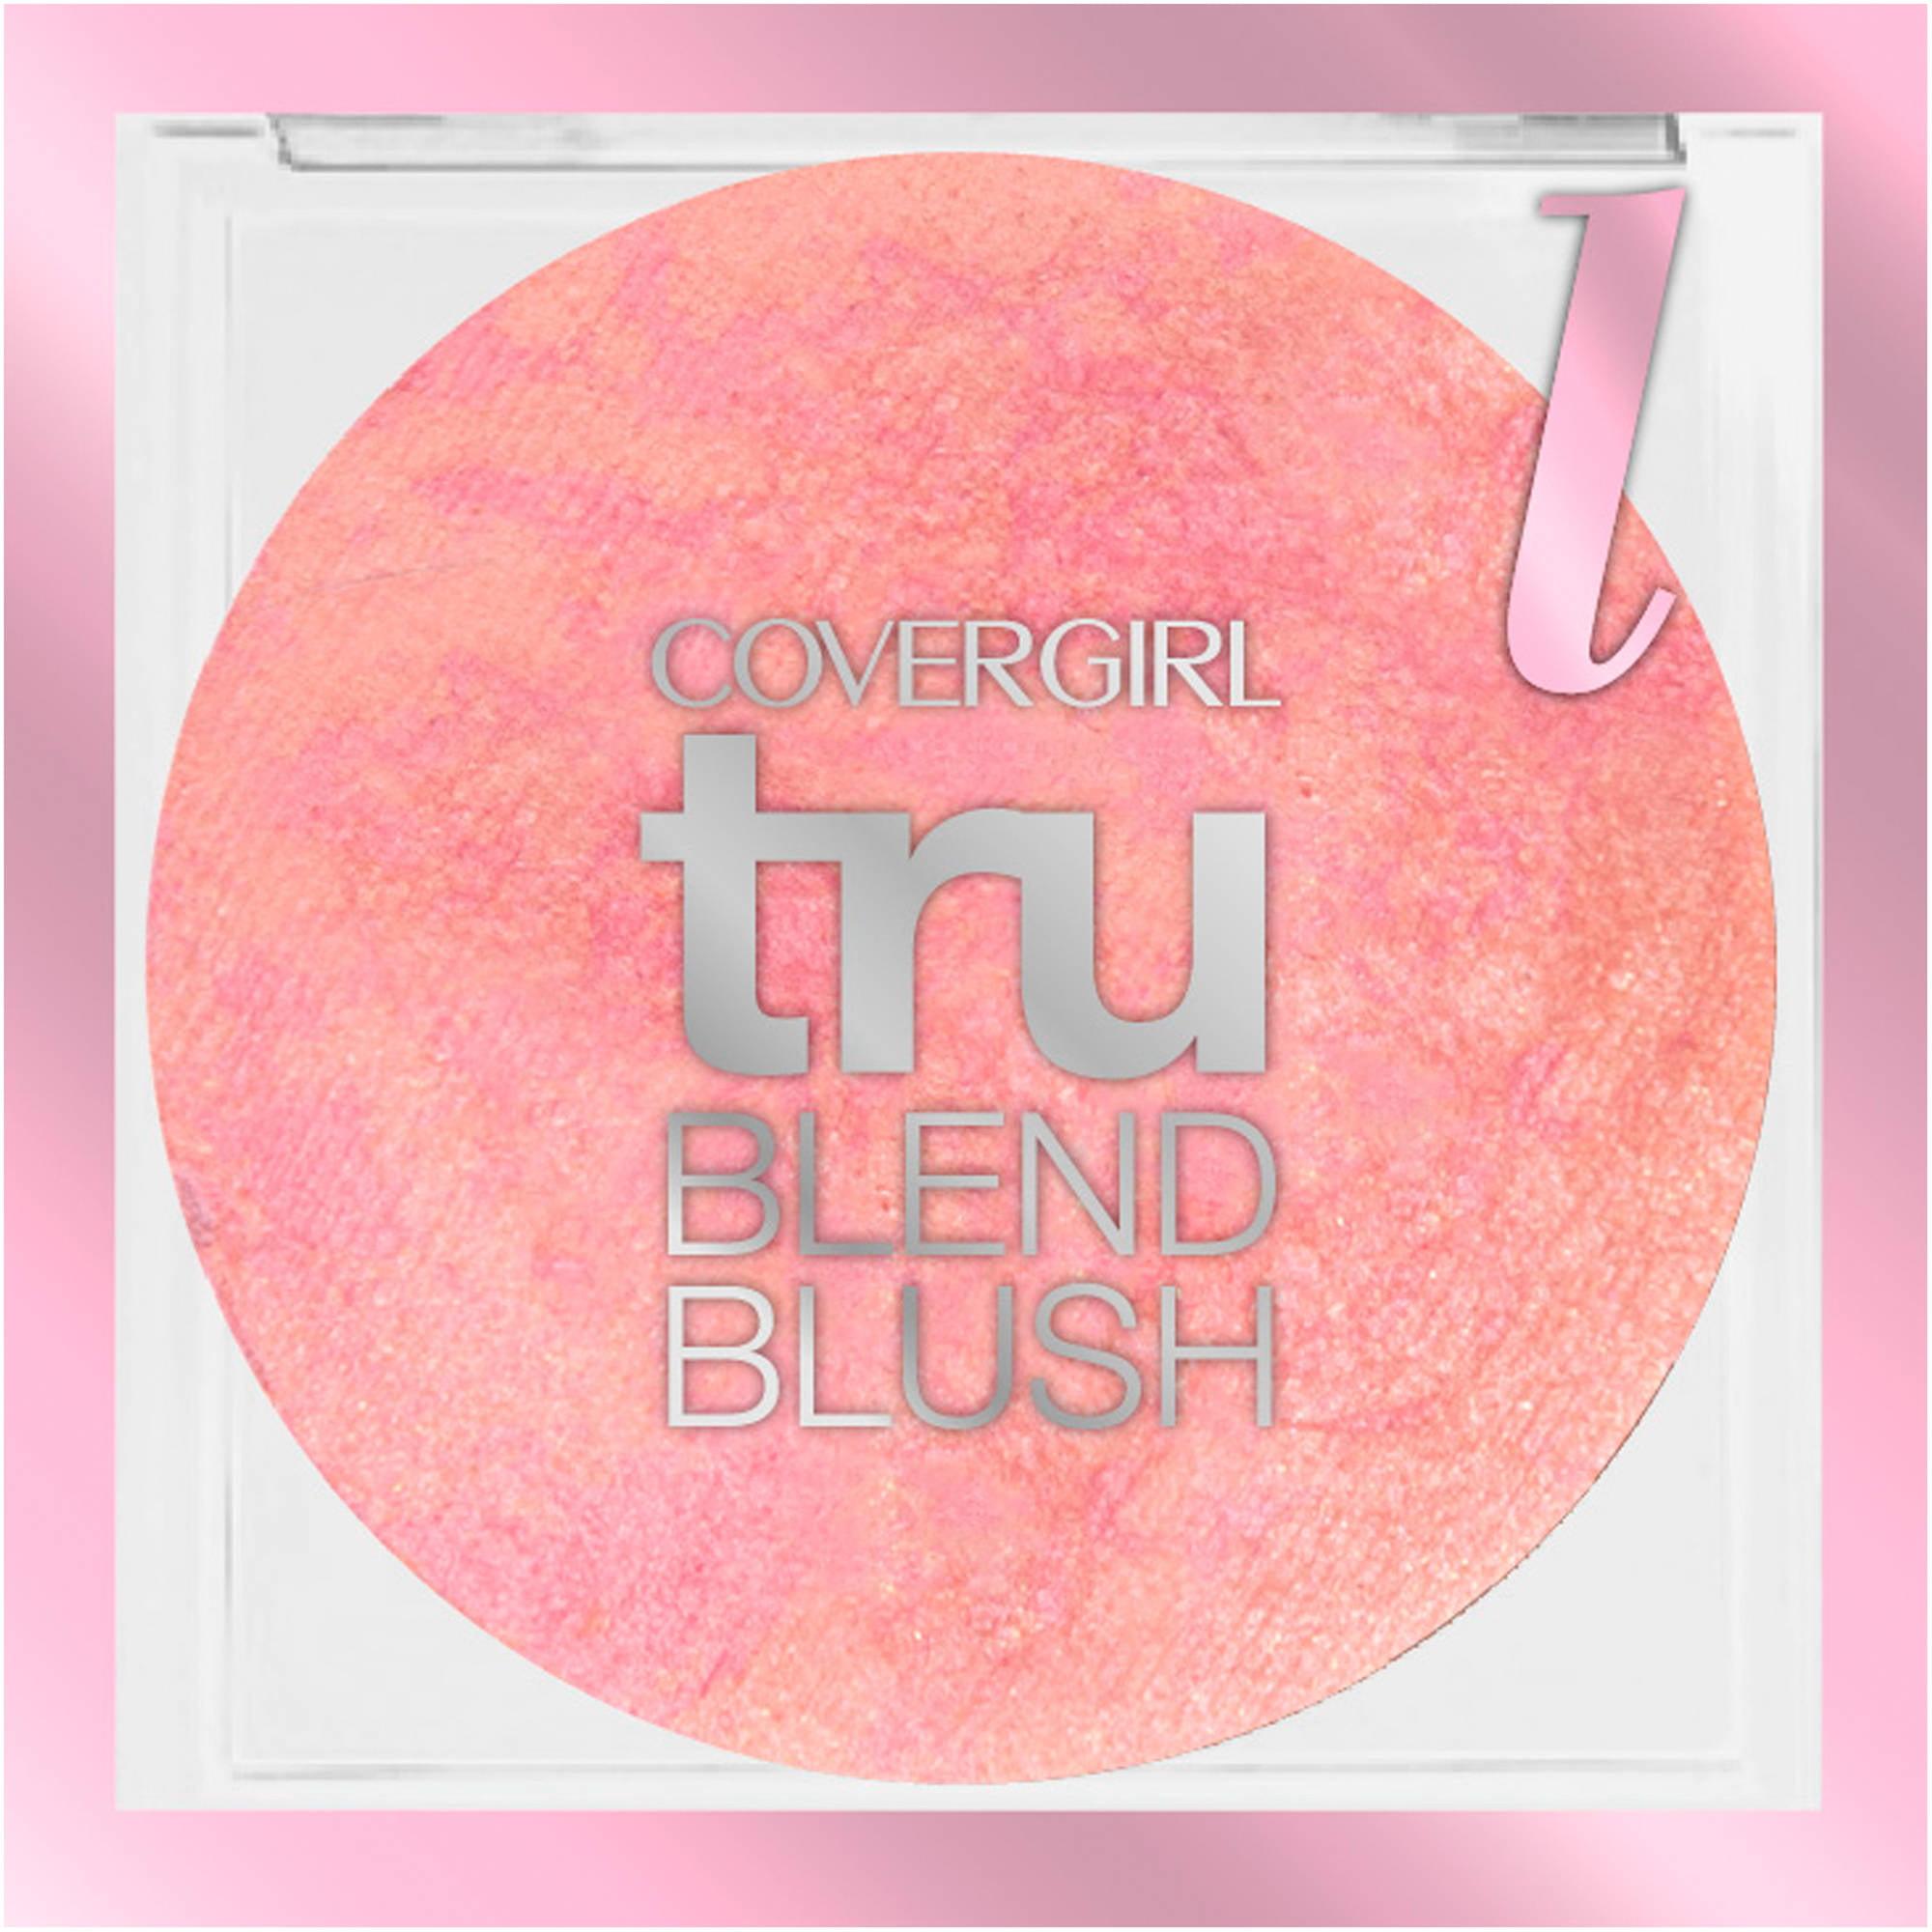 COVERGIRL truBlend Blush, Light Rose, .1 oz